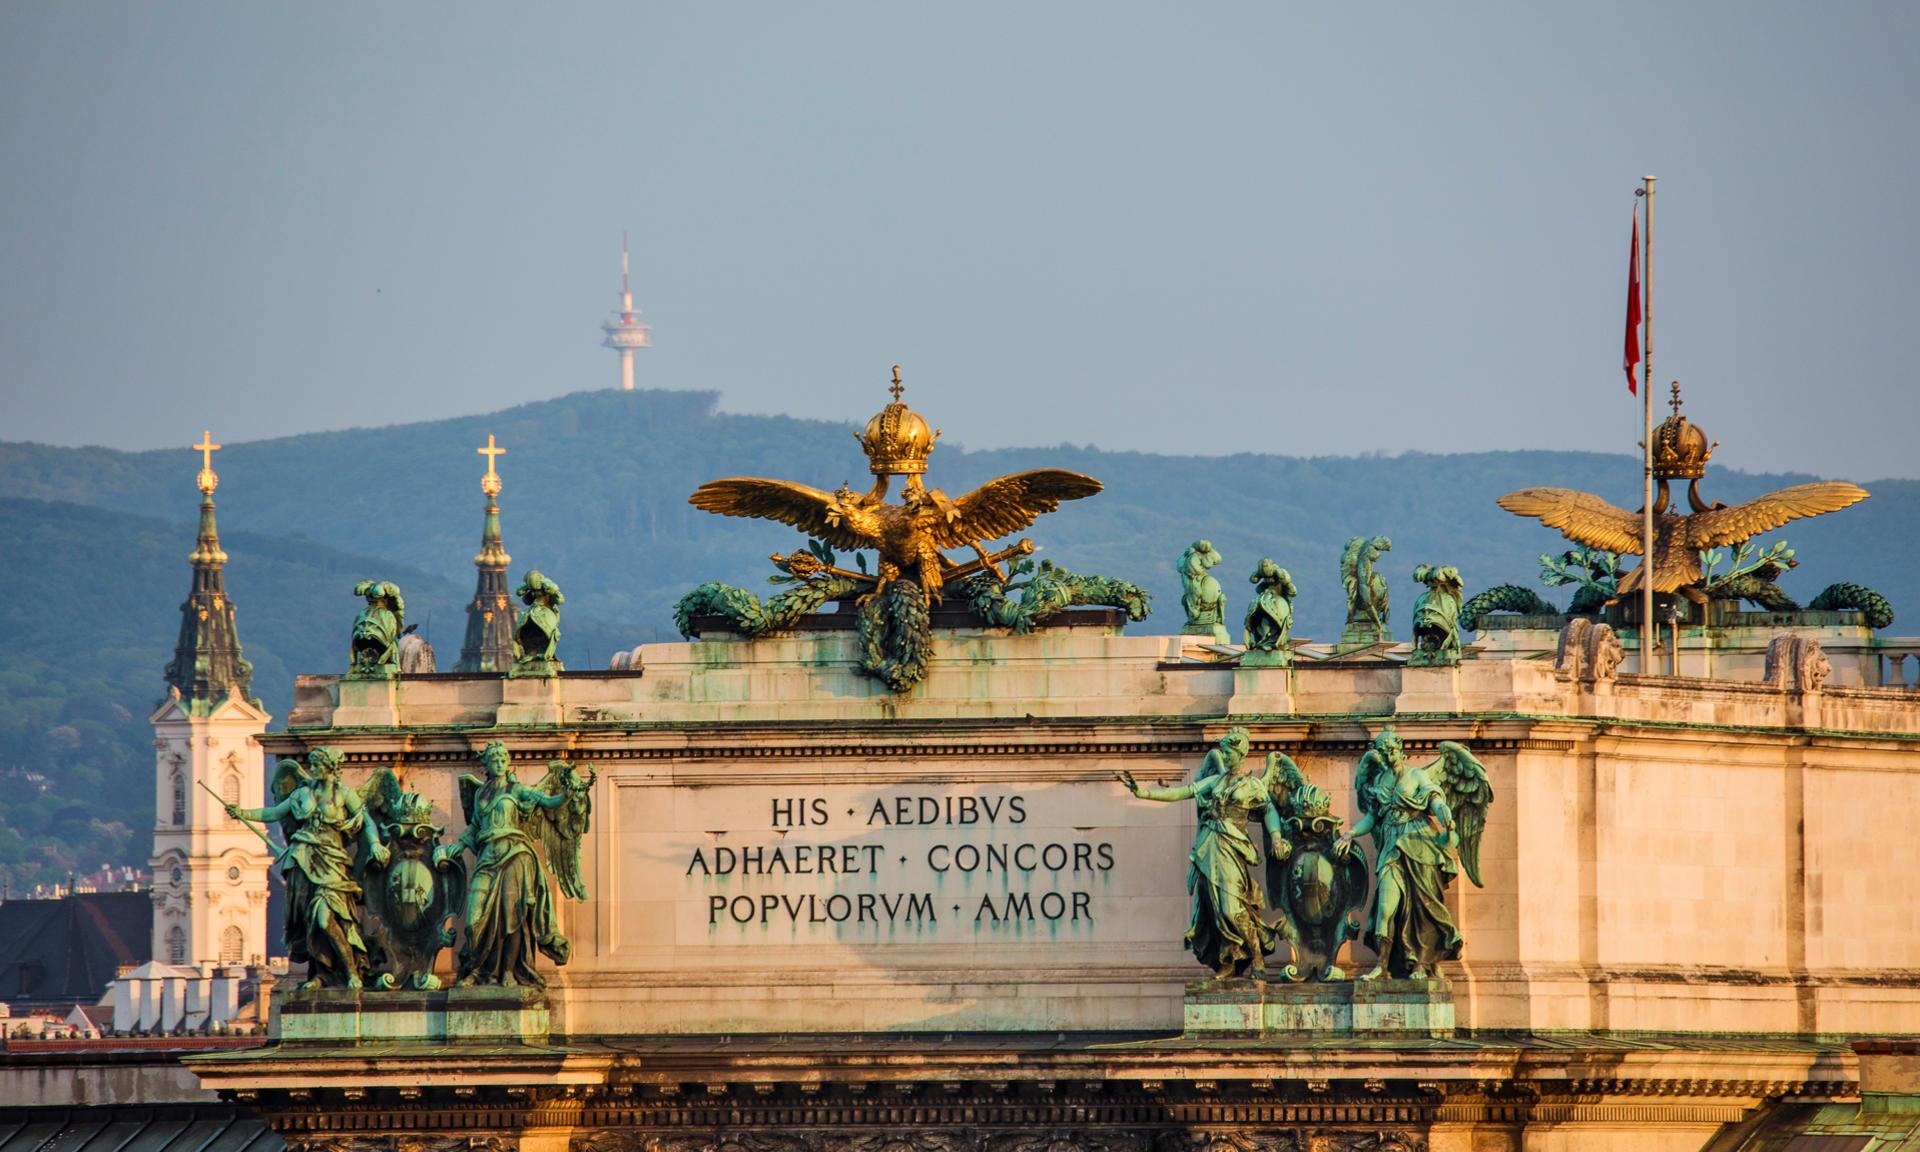 © Wien-Tourismus | Christian Stemper